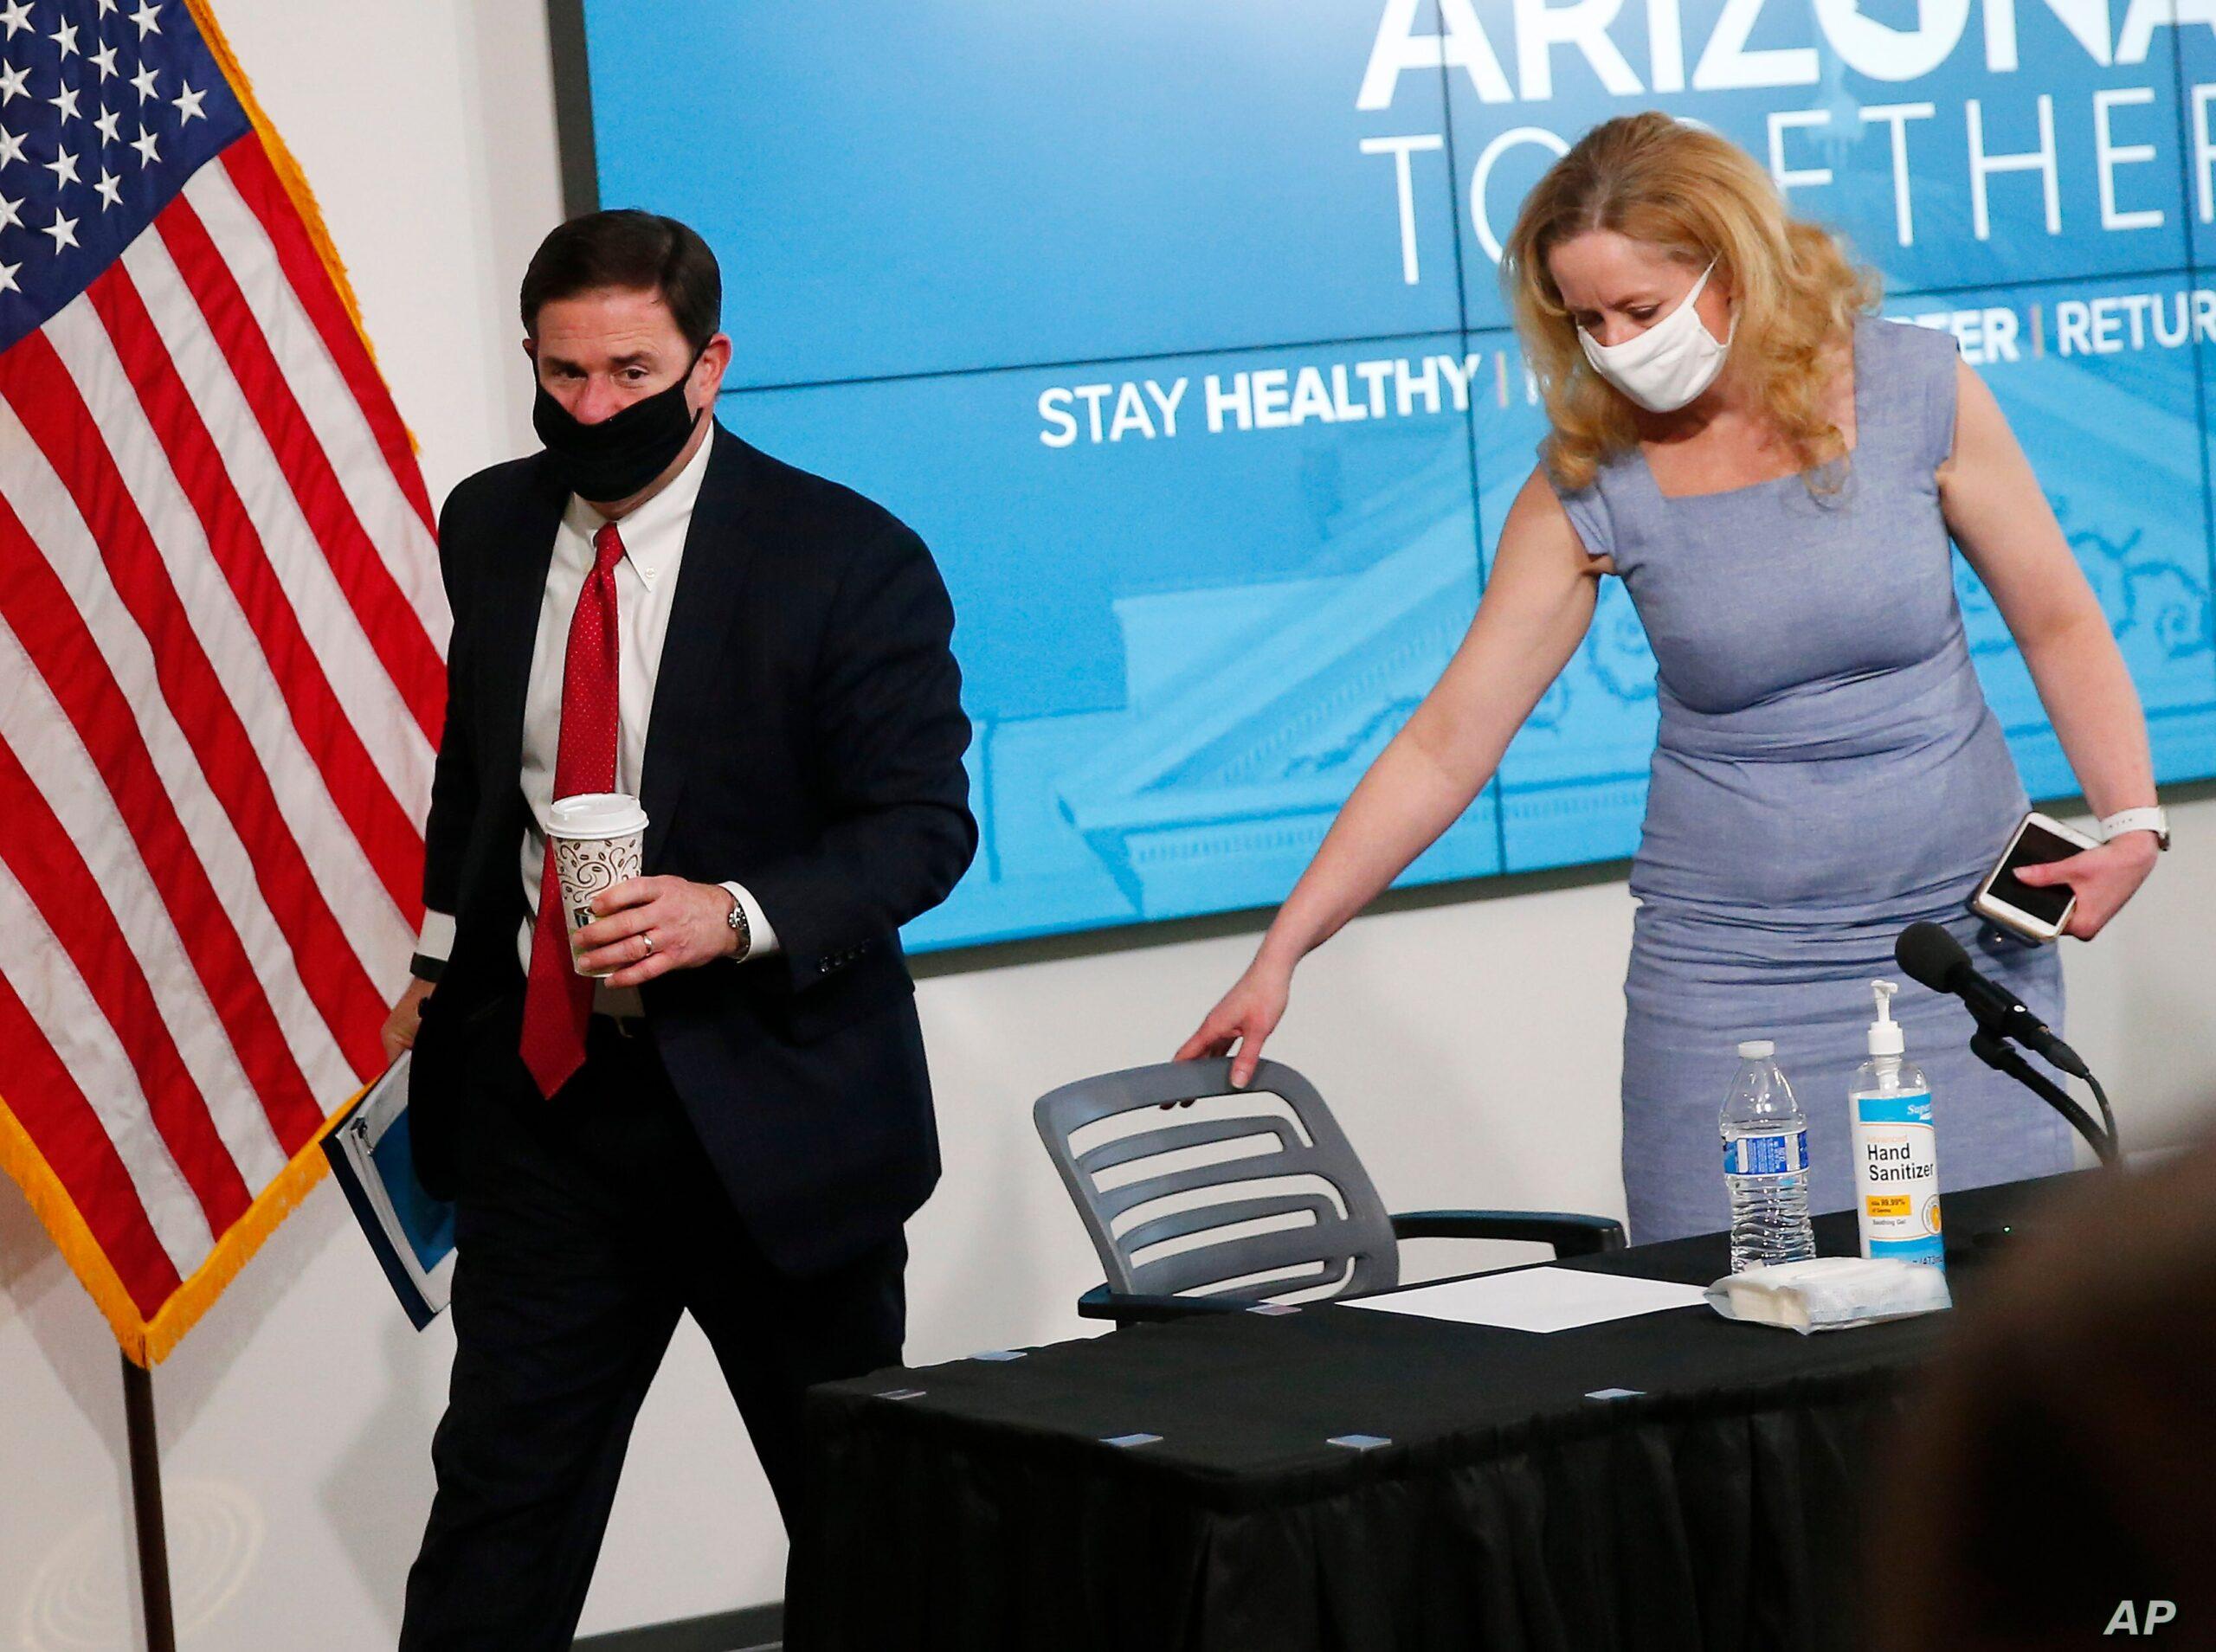 Despite growth, Arizona doesn't add congress member